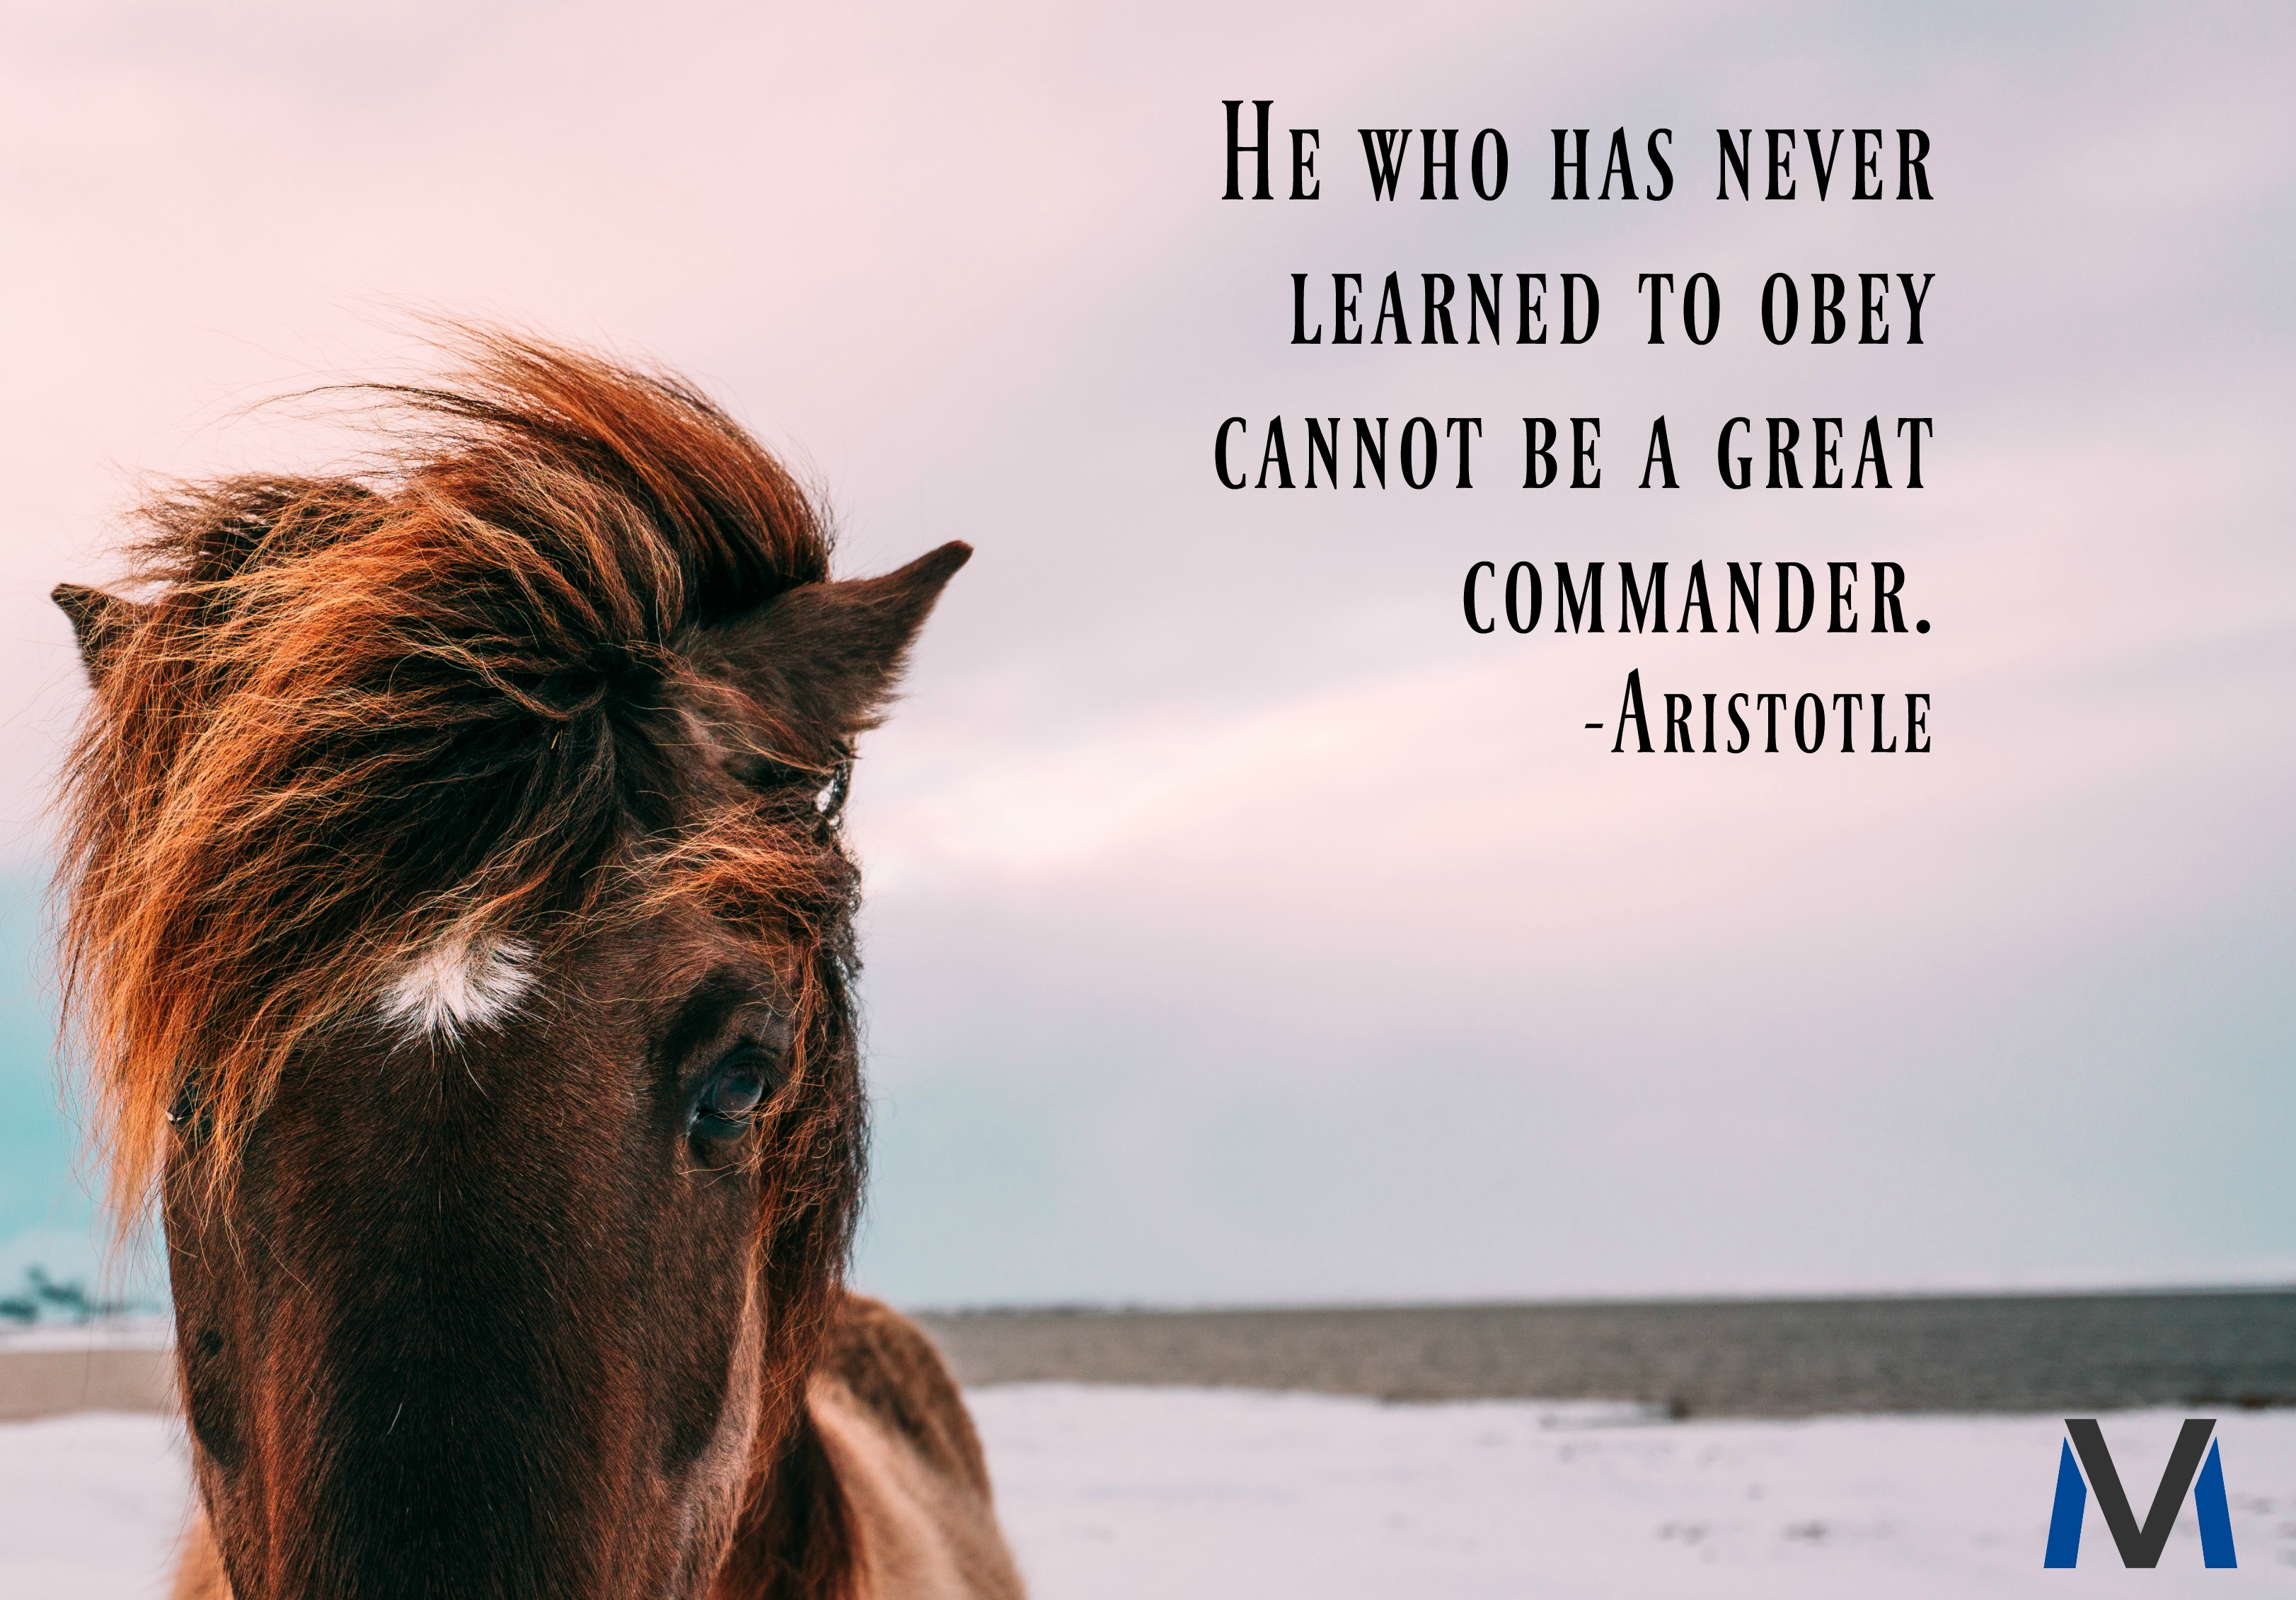 aristotle-commander